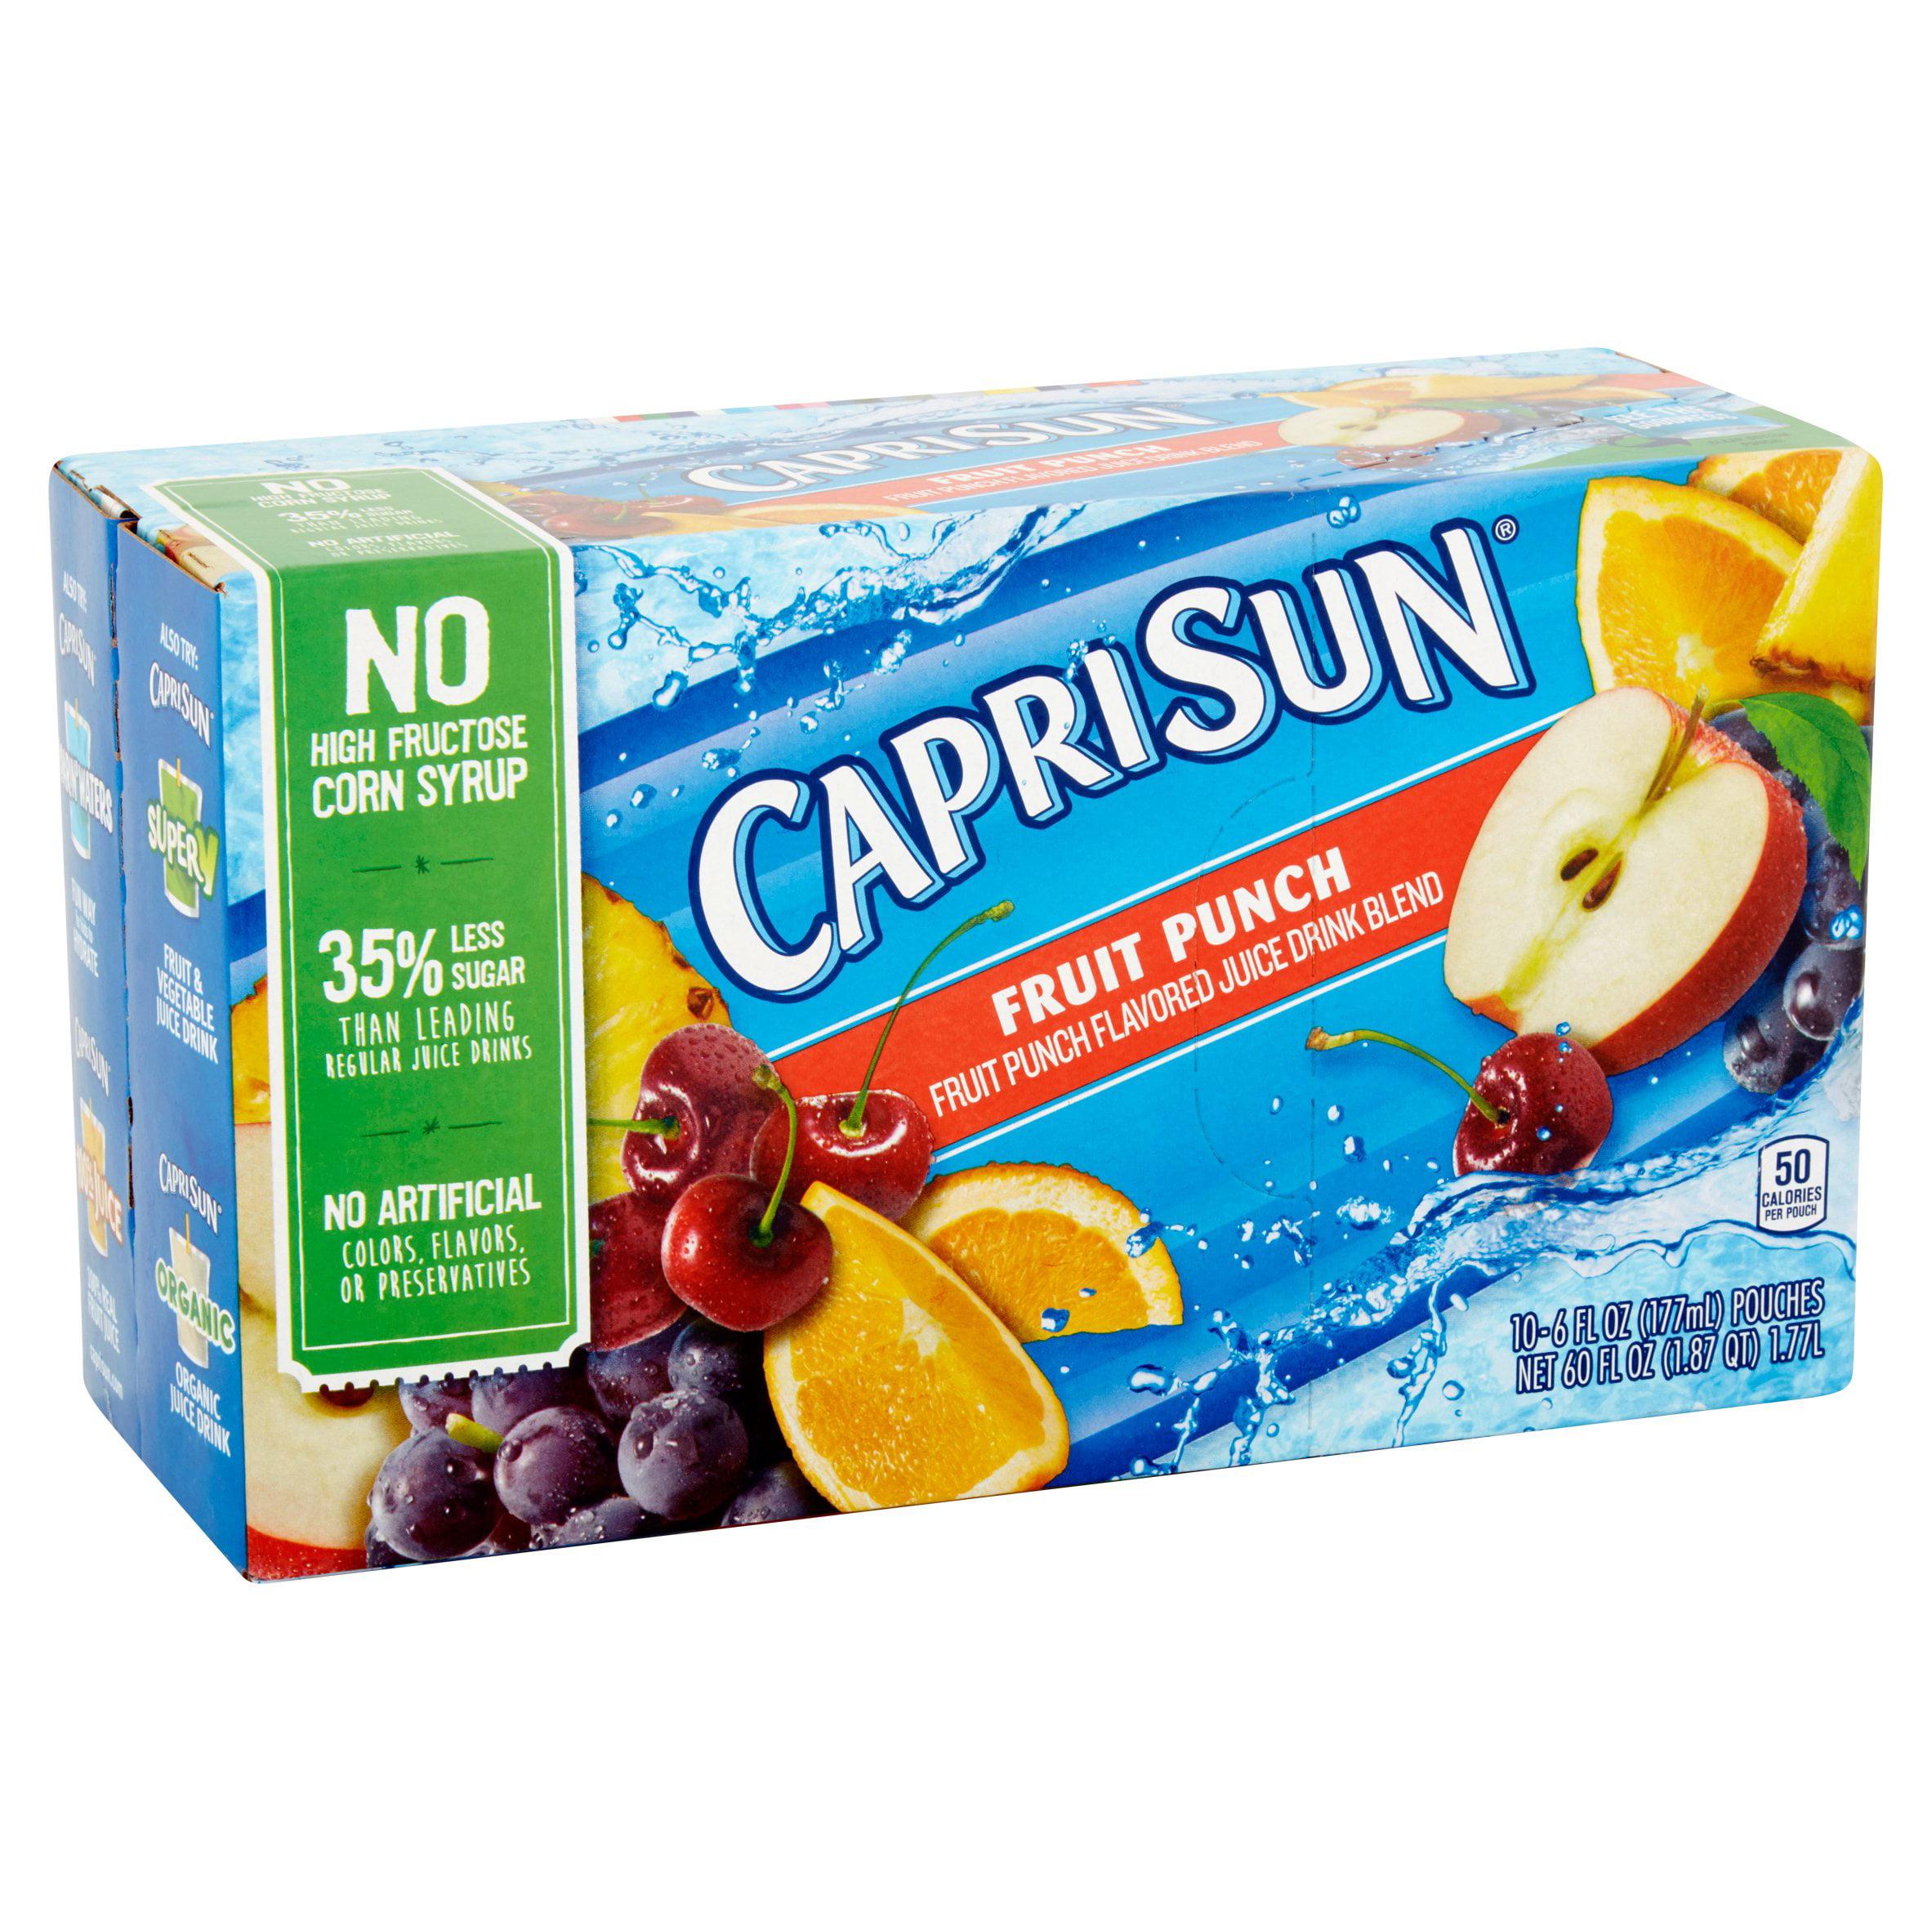 Capri Sun Fruit Punch Juice Drink Blend, 10 count, 60 Fl Oz by Kraft Foods Group, Inc.